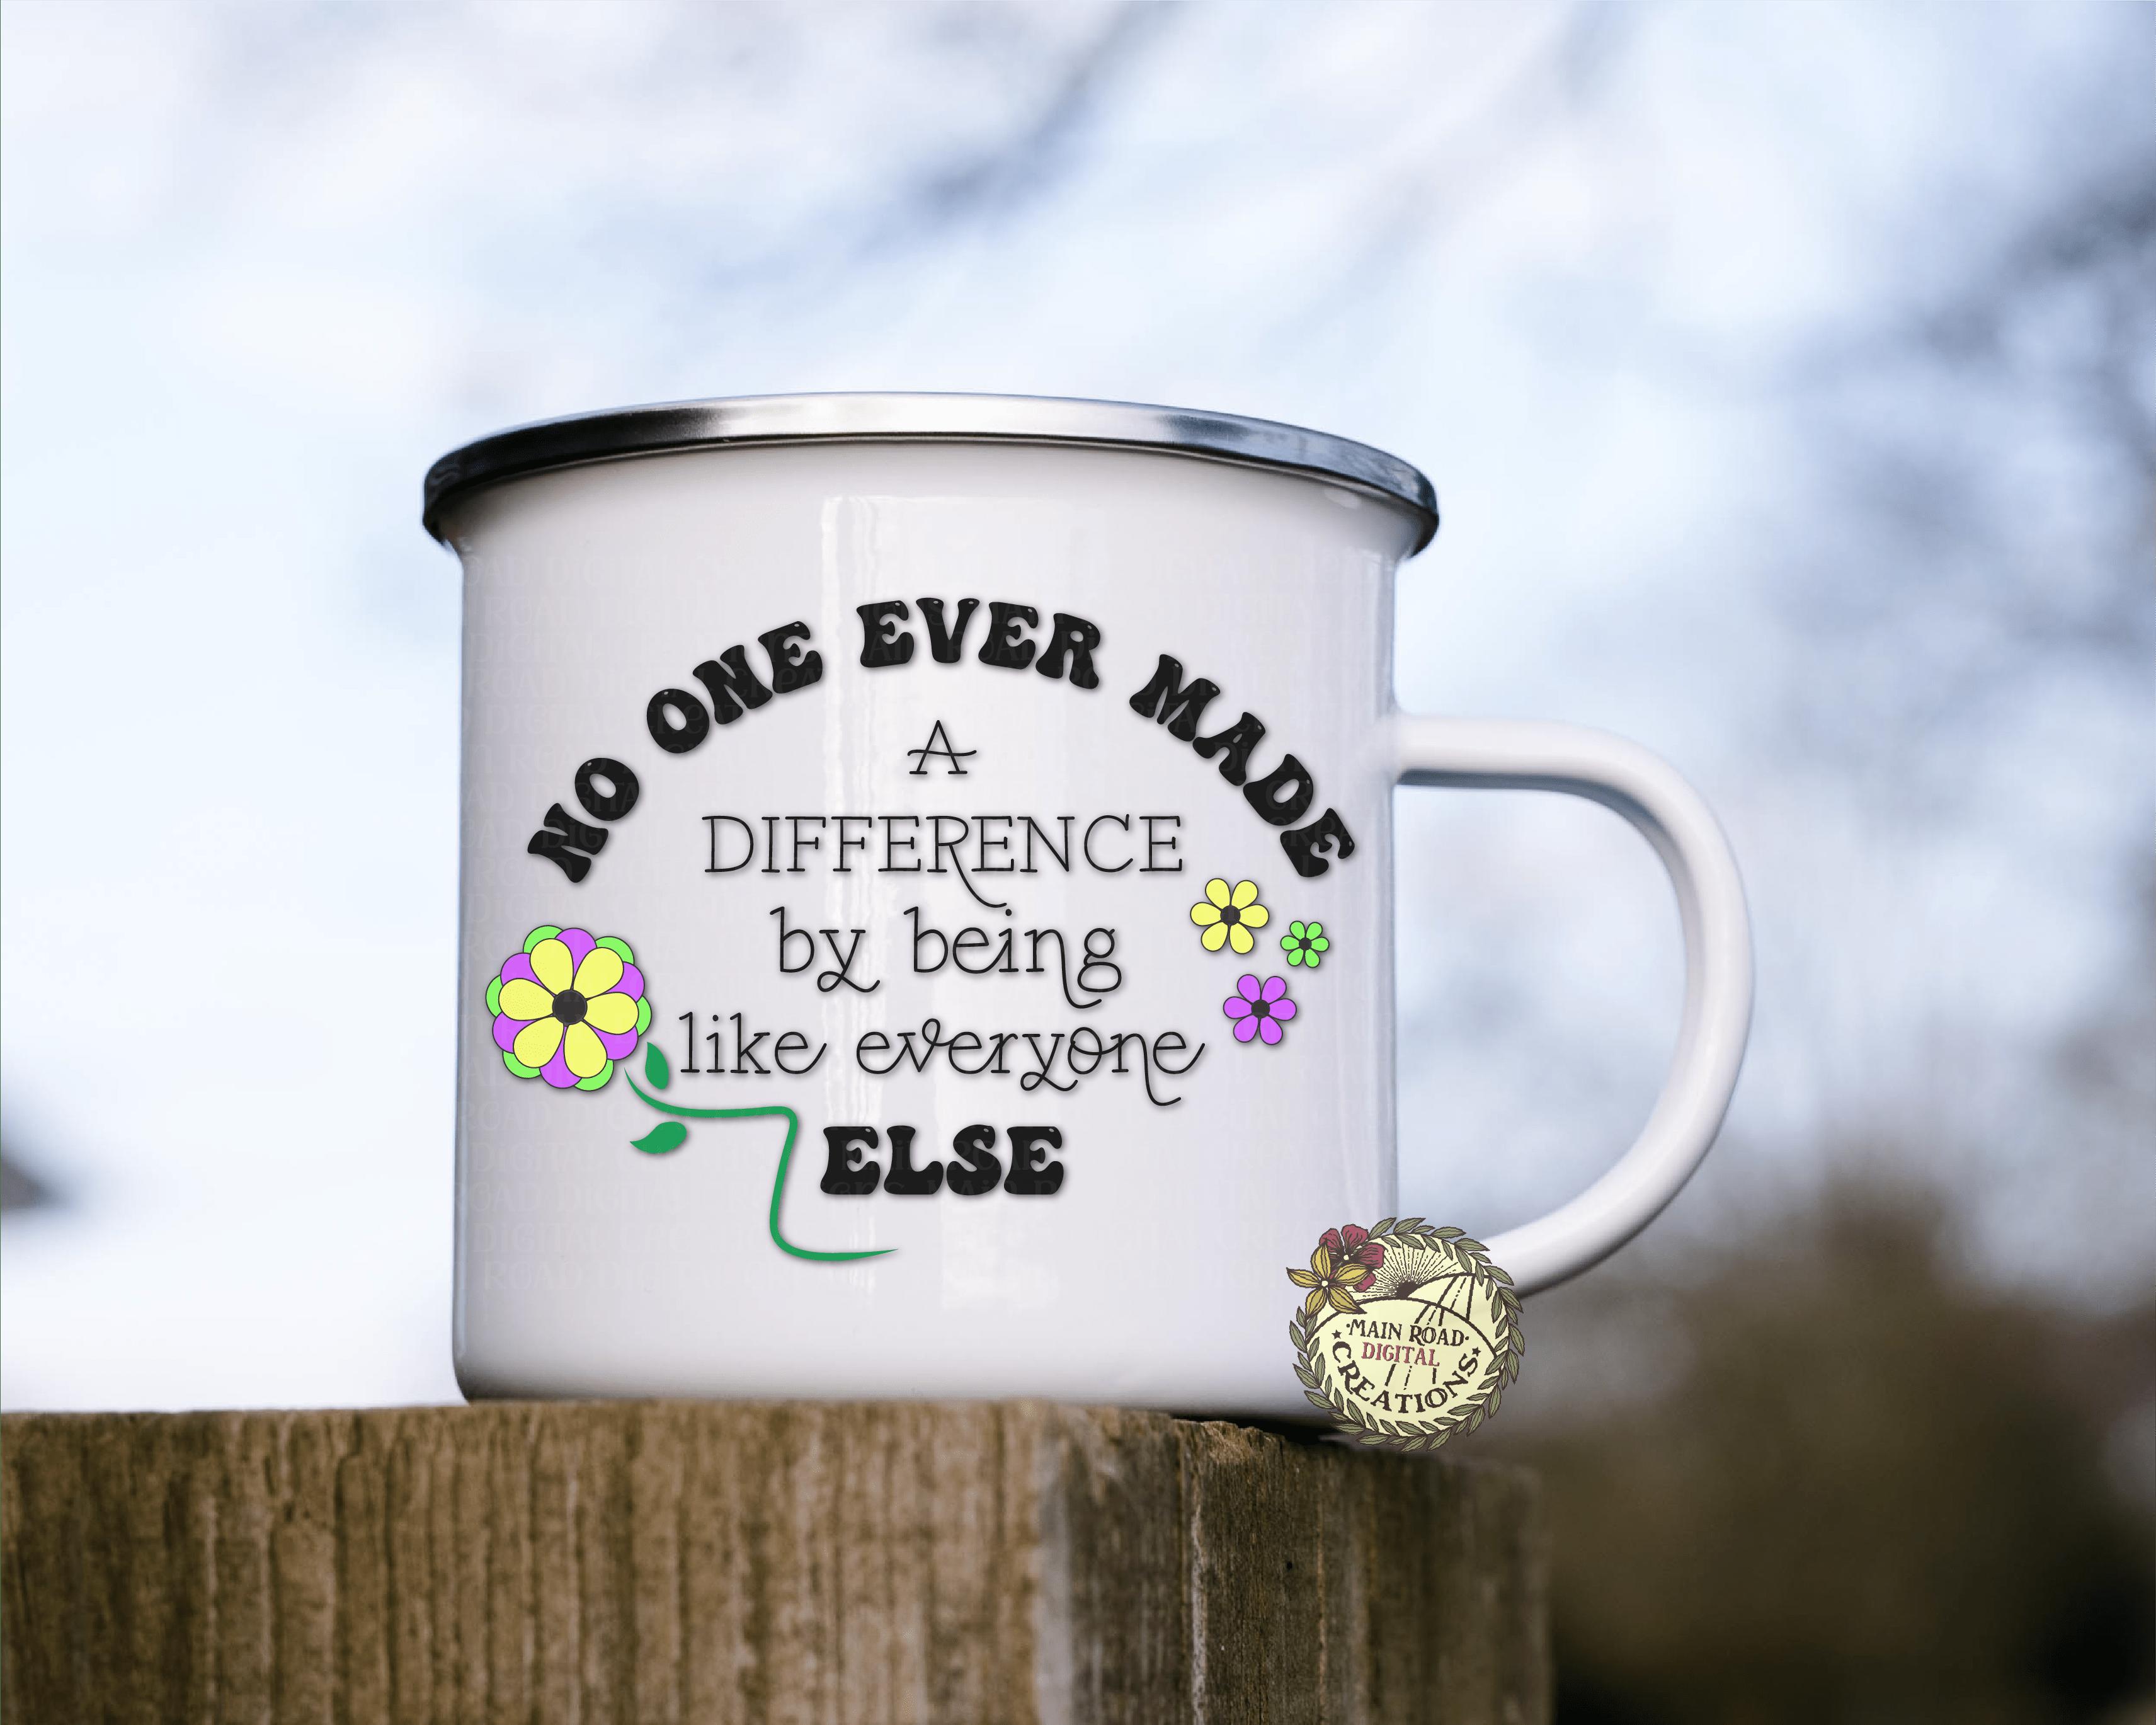 free difference maker svg on coffee mug